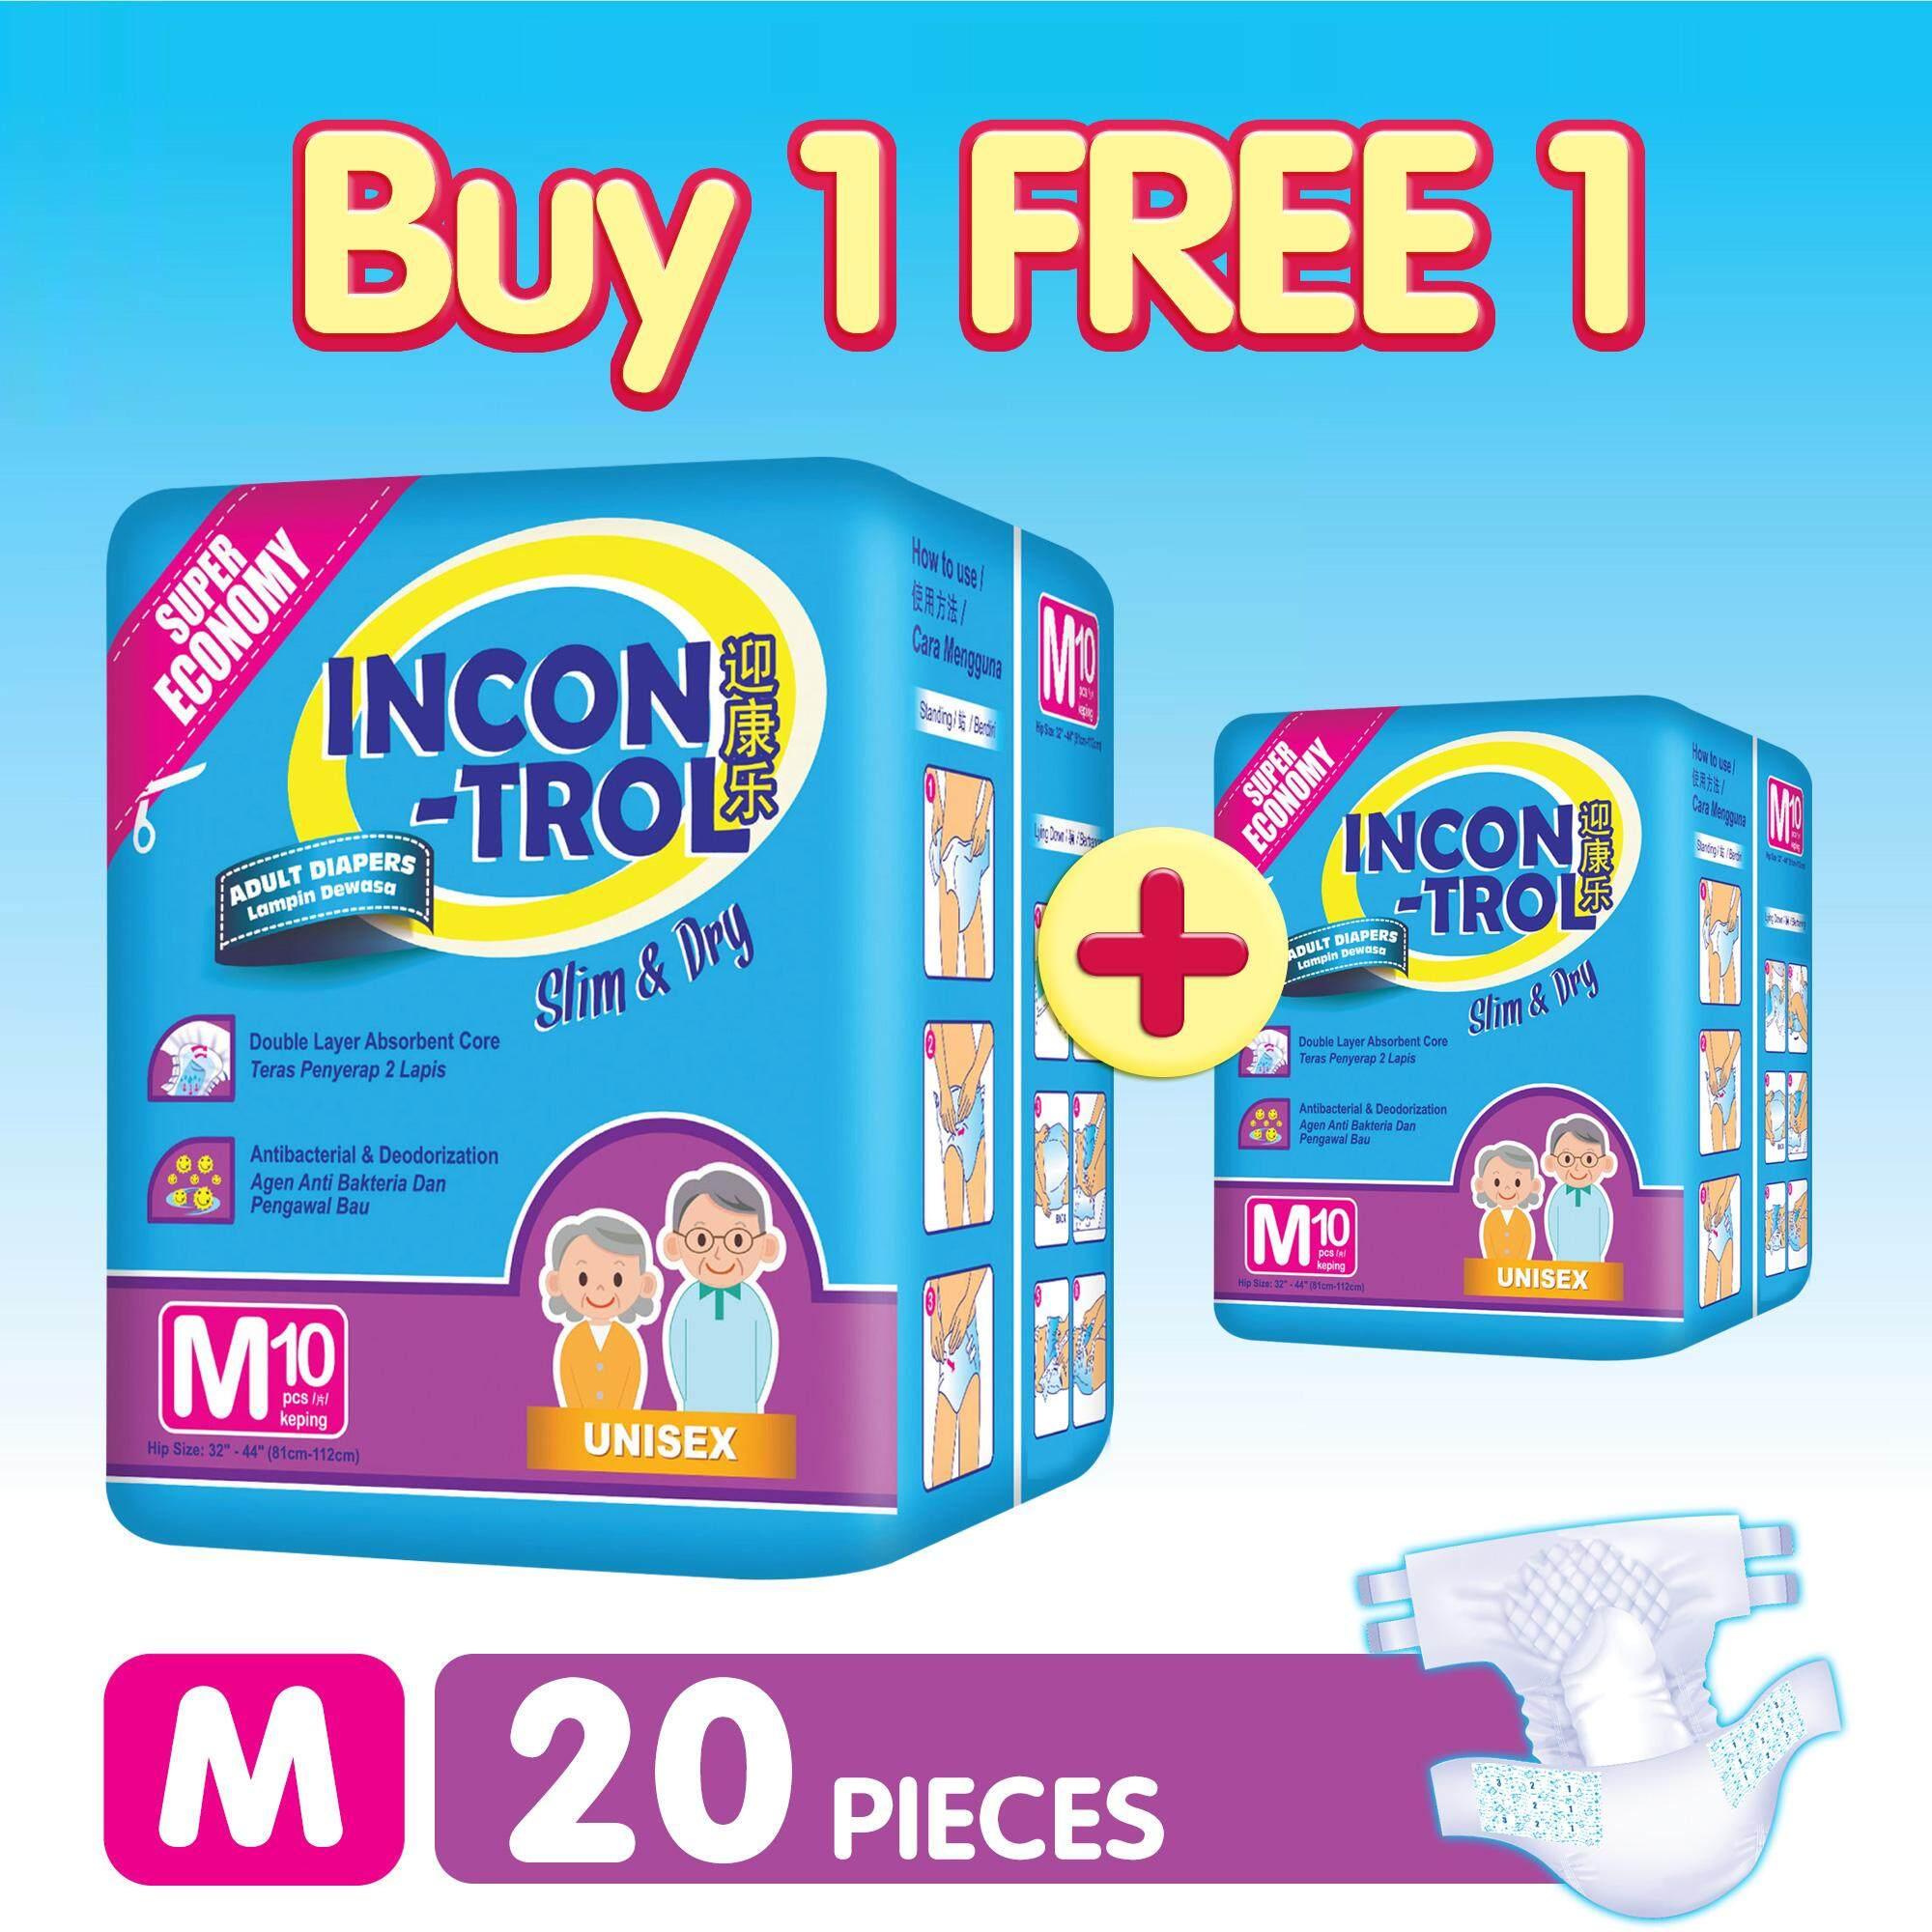 [B1F1] Incontrol Adult Tape Diapers M10 [WangZheng CARE]